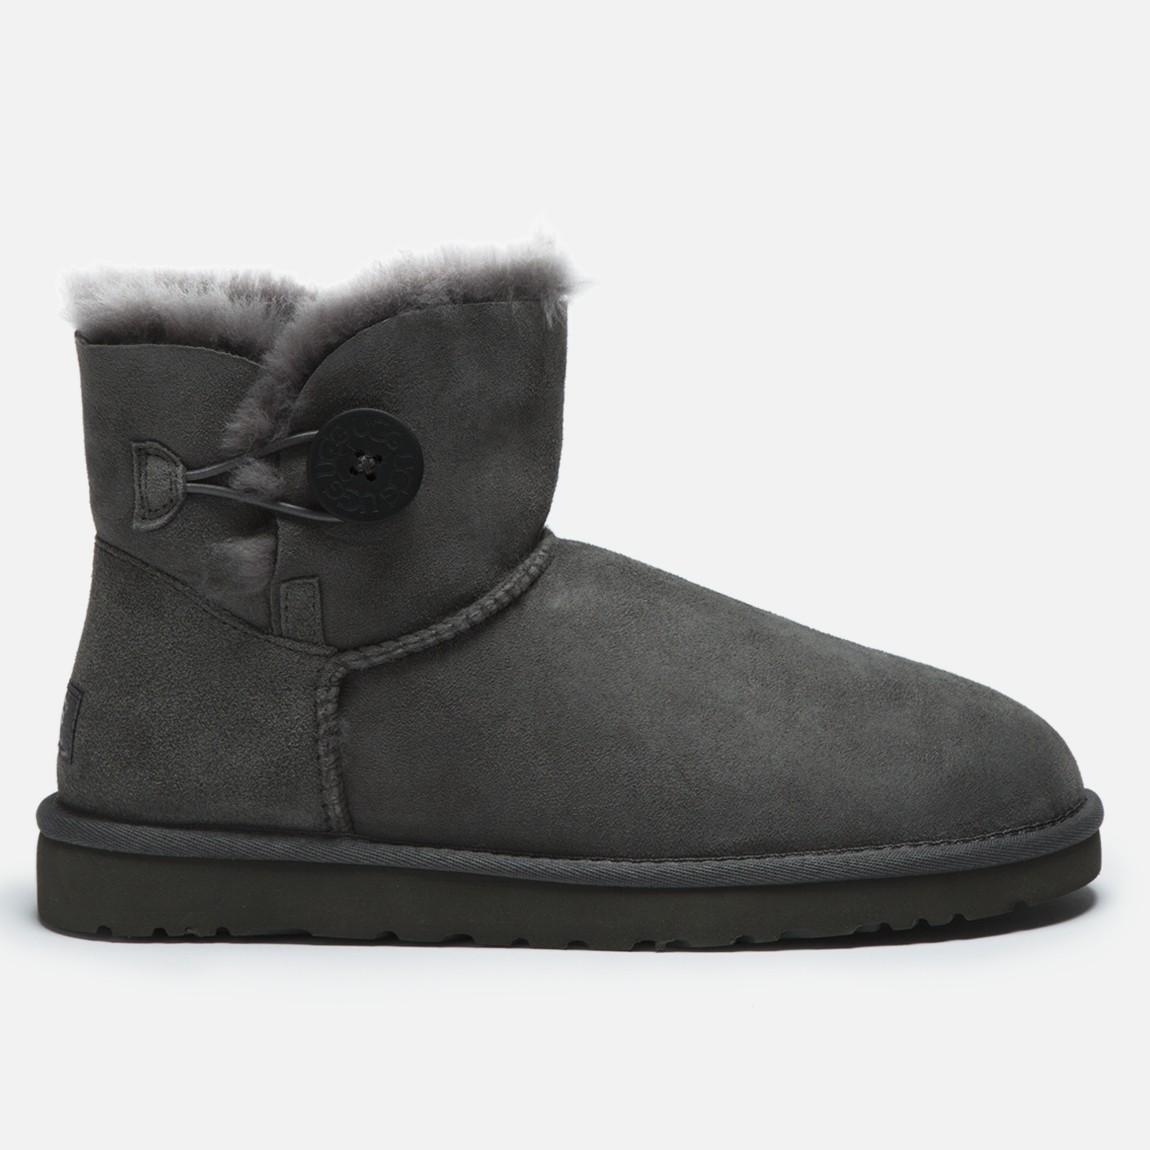 2849030e1c3 Ugg Boots Karrinyup